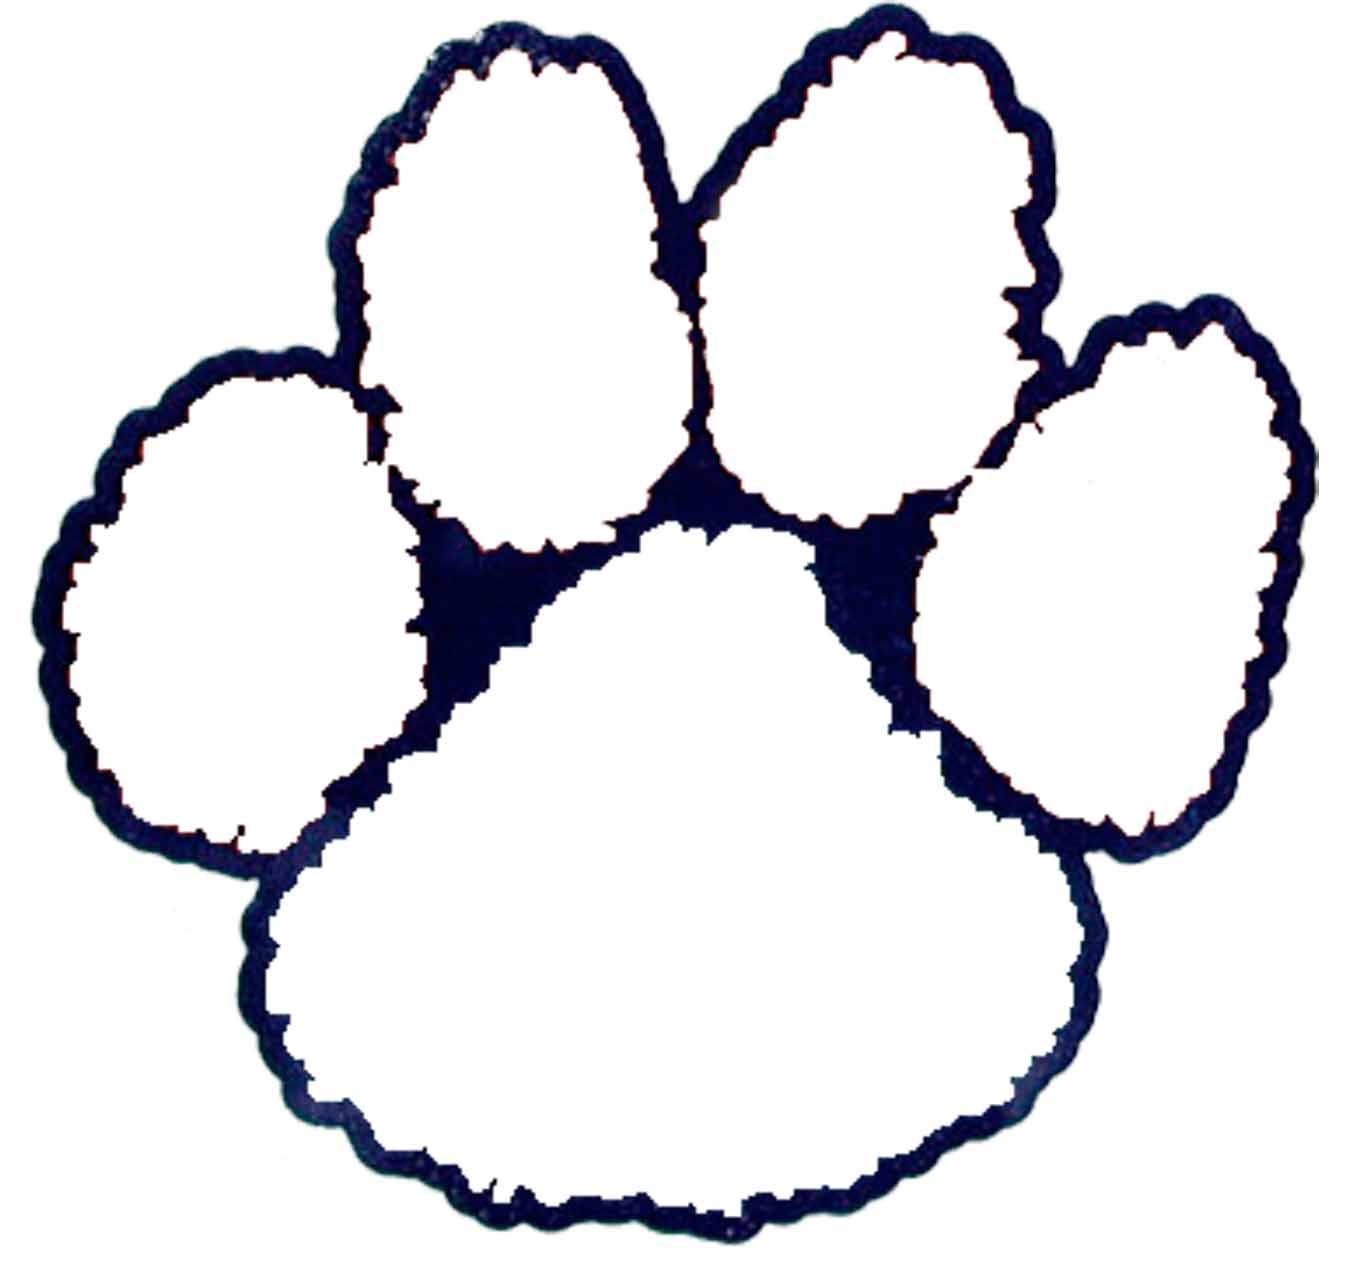 Tiger Paw Outline Free Download Clip Art.